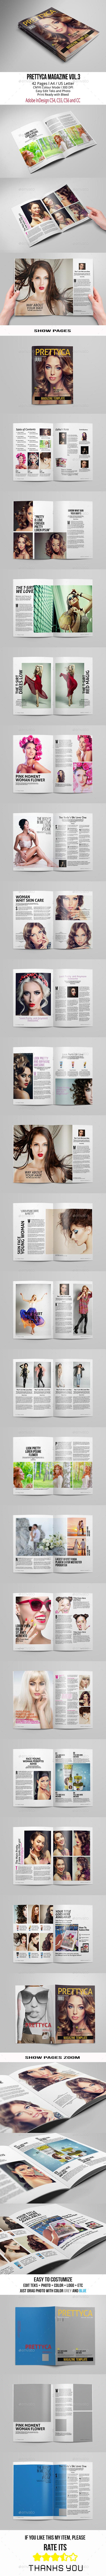 Prettyca Magazine Vol.3 A4/US Letter - Magazines Print Templates